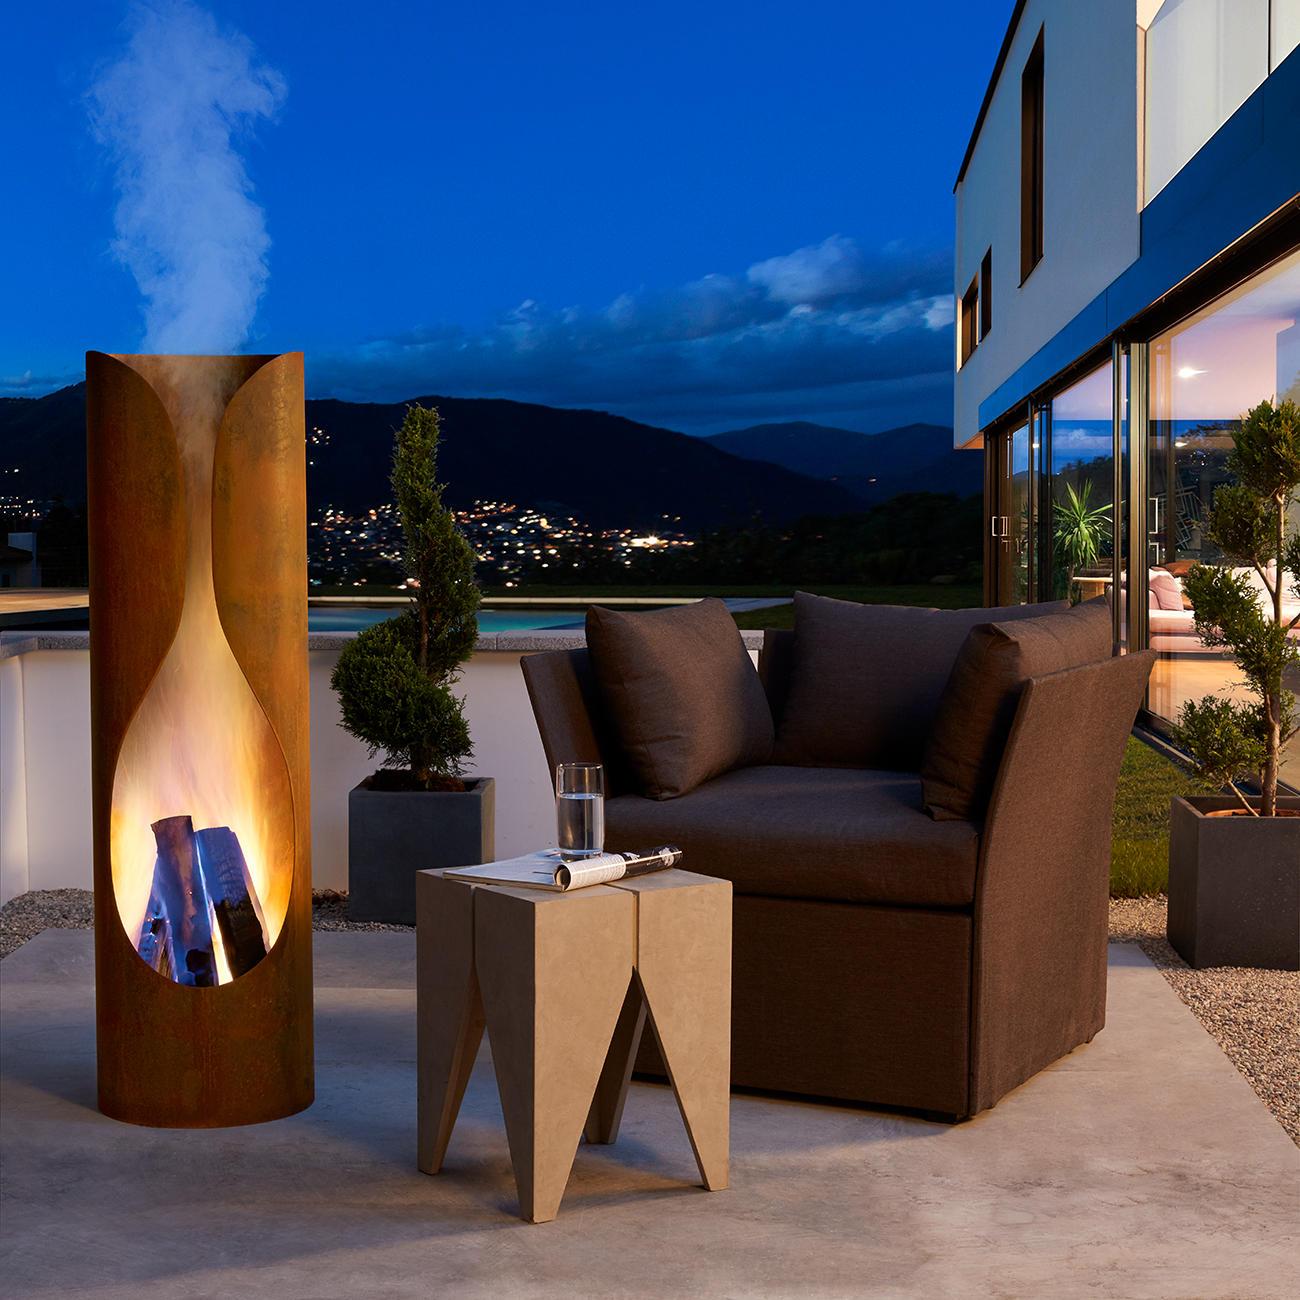 Prix Cheminee Exterieur Feu Chic Design foyer masaya